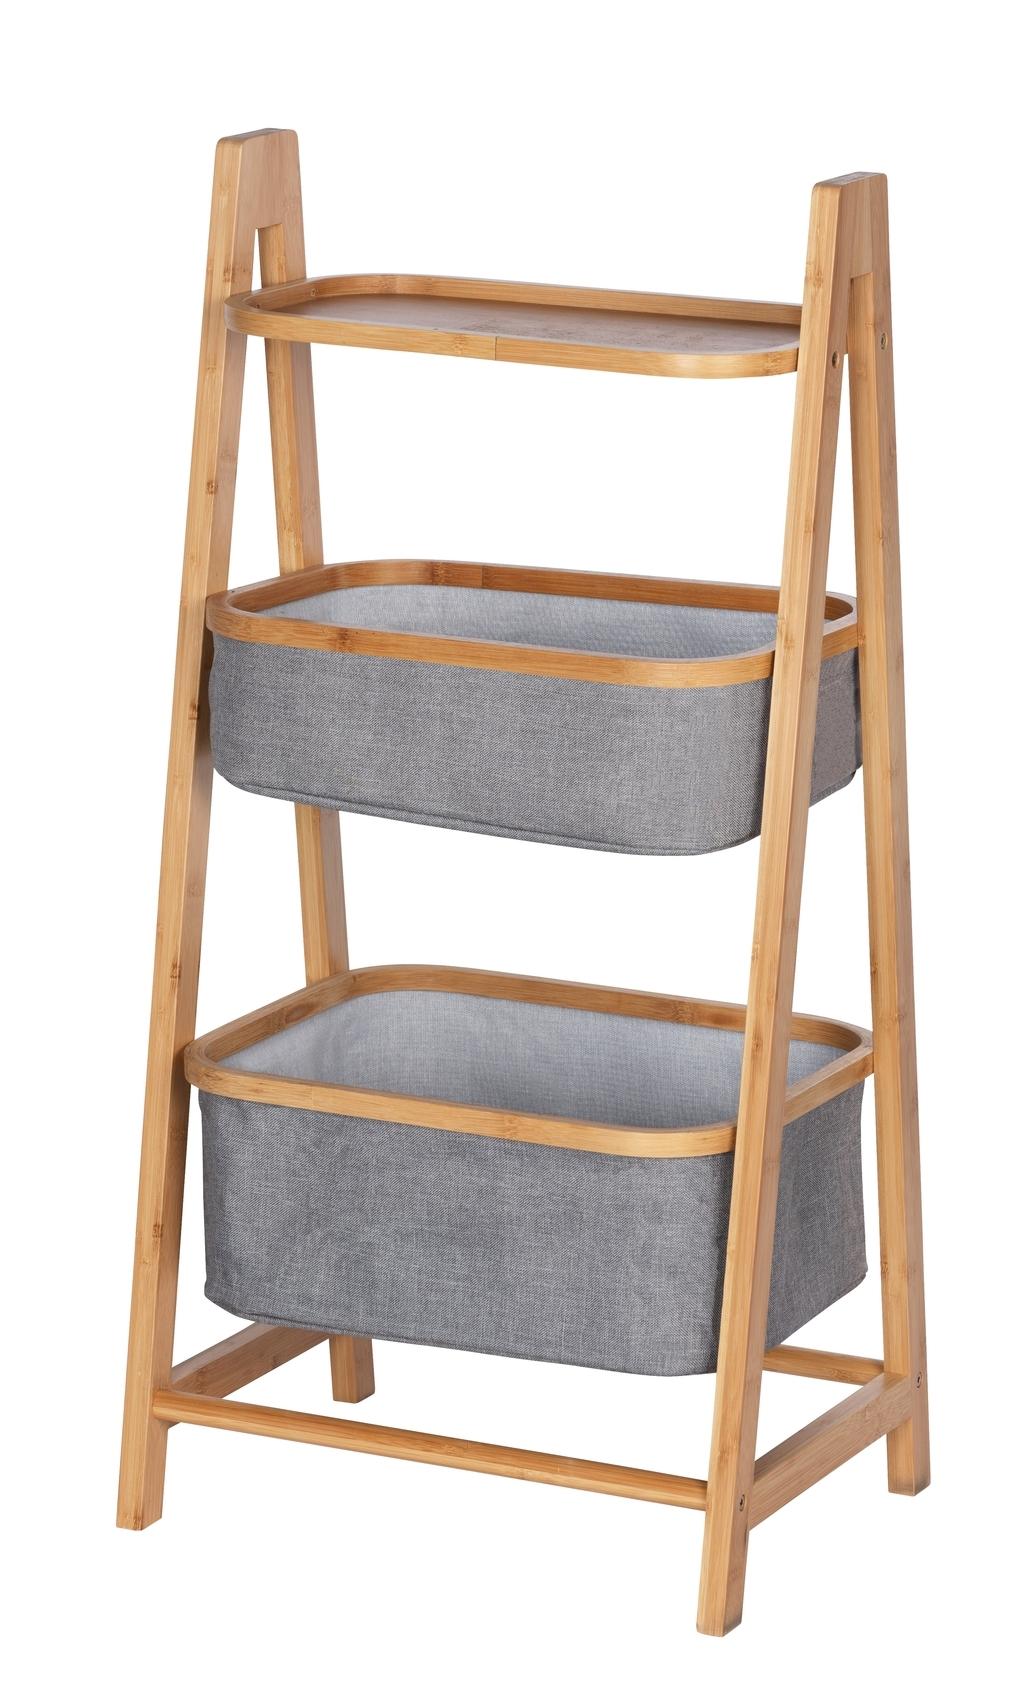 Suport cu etajera si 2 cosuri pentru depozitare, din bambus si poliester, Bahari Natural / Gri, l44xA34xH91 cm